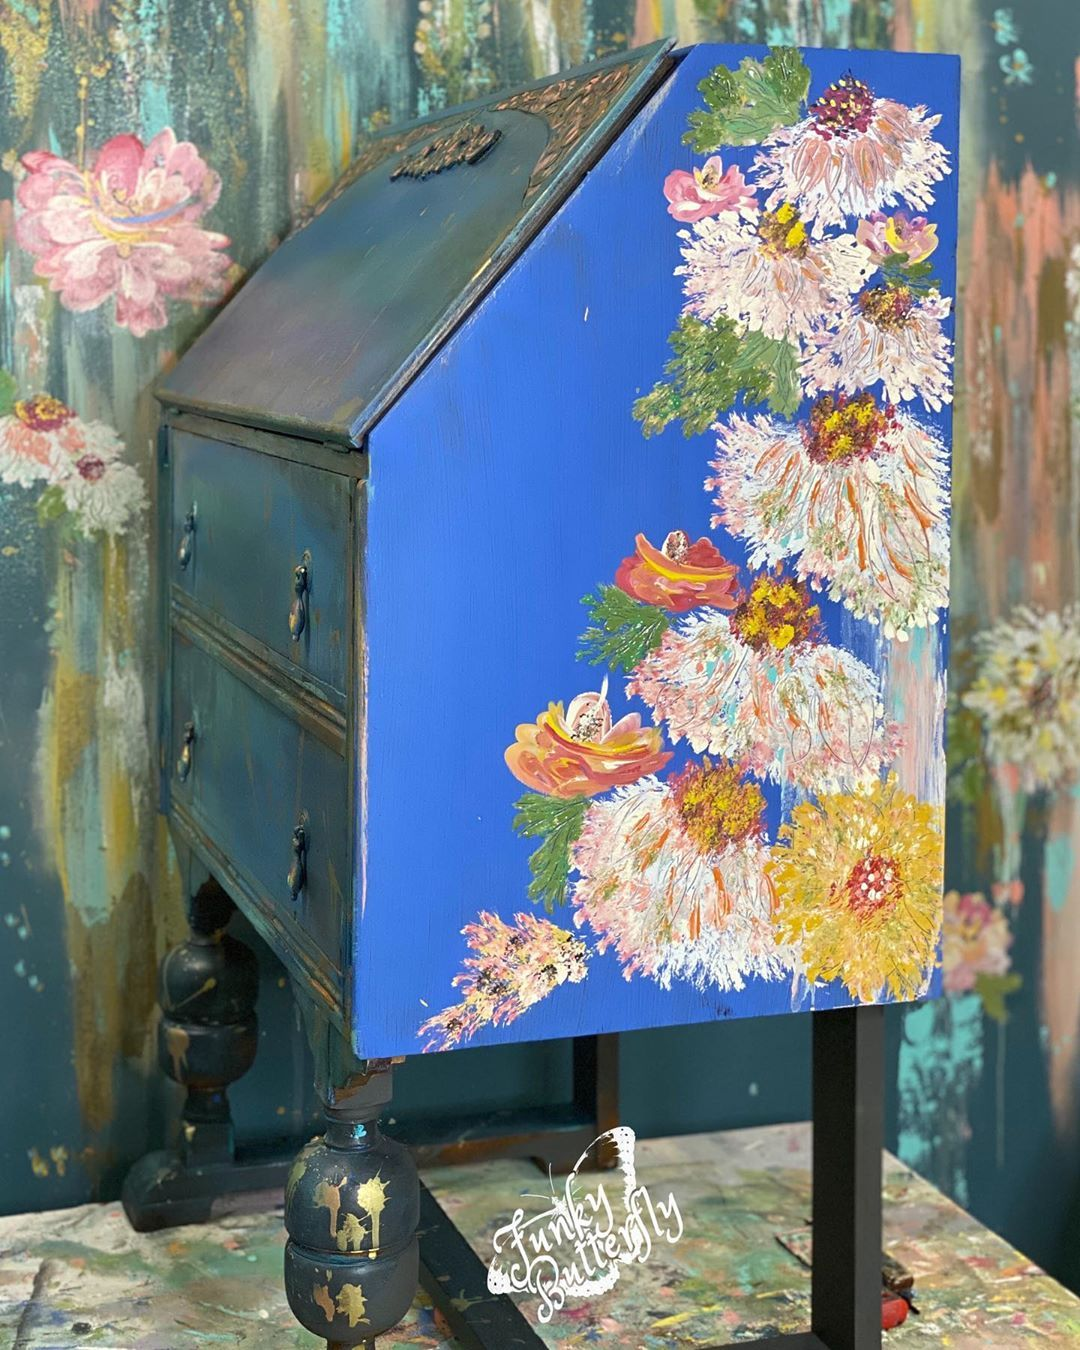 "Funky Butterfly 🦋 on Instagram: ""Finishing up this magical desk. She's almost done #diypaint #debisdesigndiary #furnitureartist #handpaintedfurniture #handpaintedflowers…"""